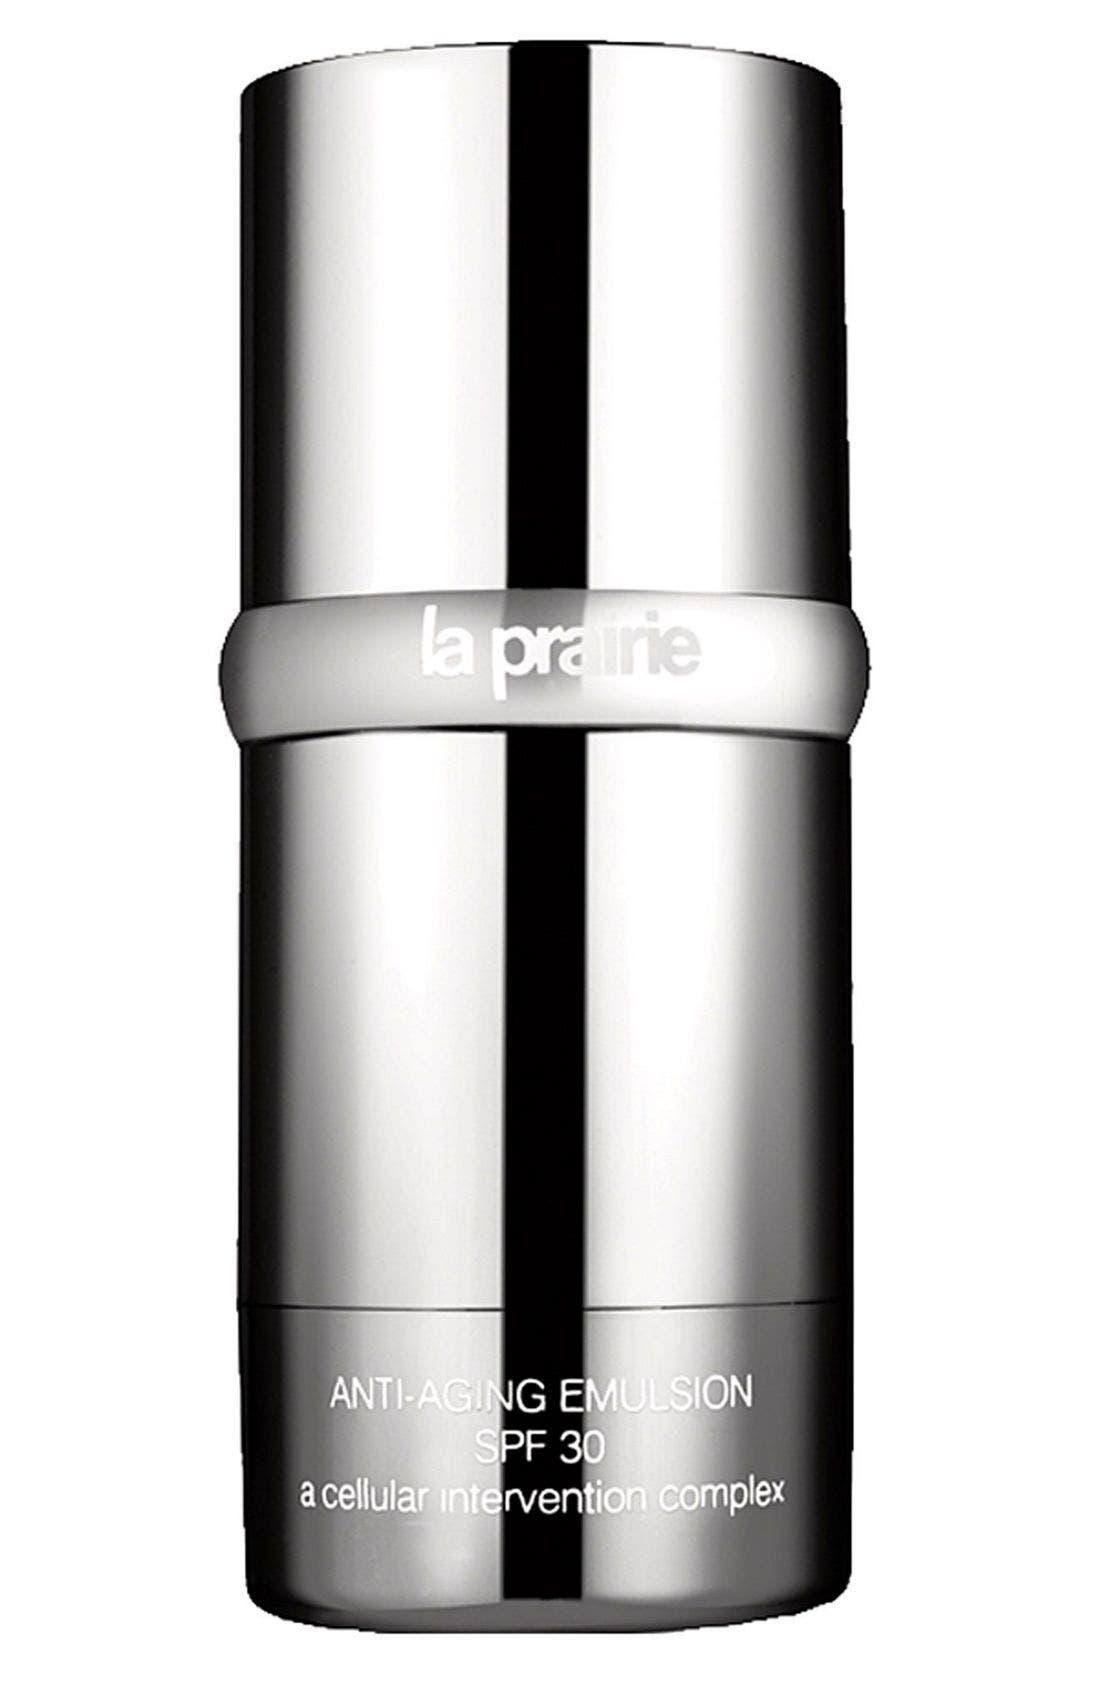 La Prairie Anti-Aging Emulsion Sunscreen Broad Spectrum SPF 30